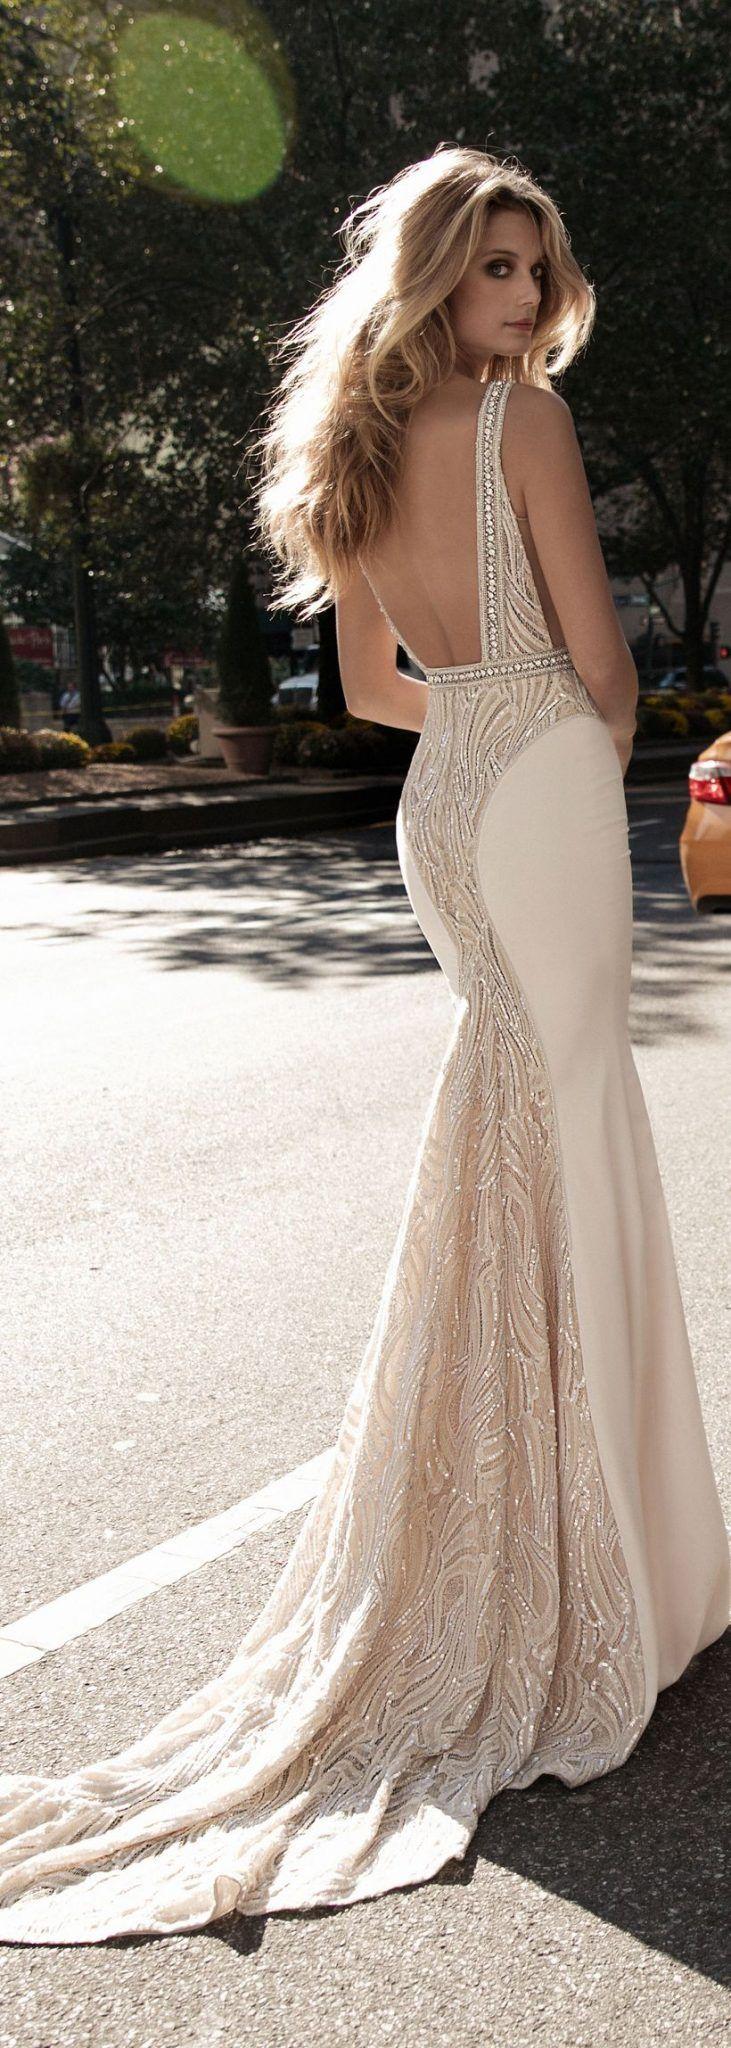 design ideas to make wedding dresses look classy and elegant